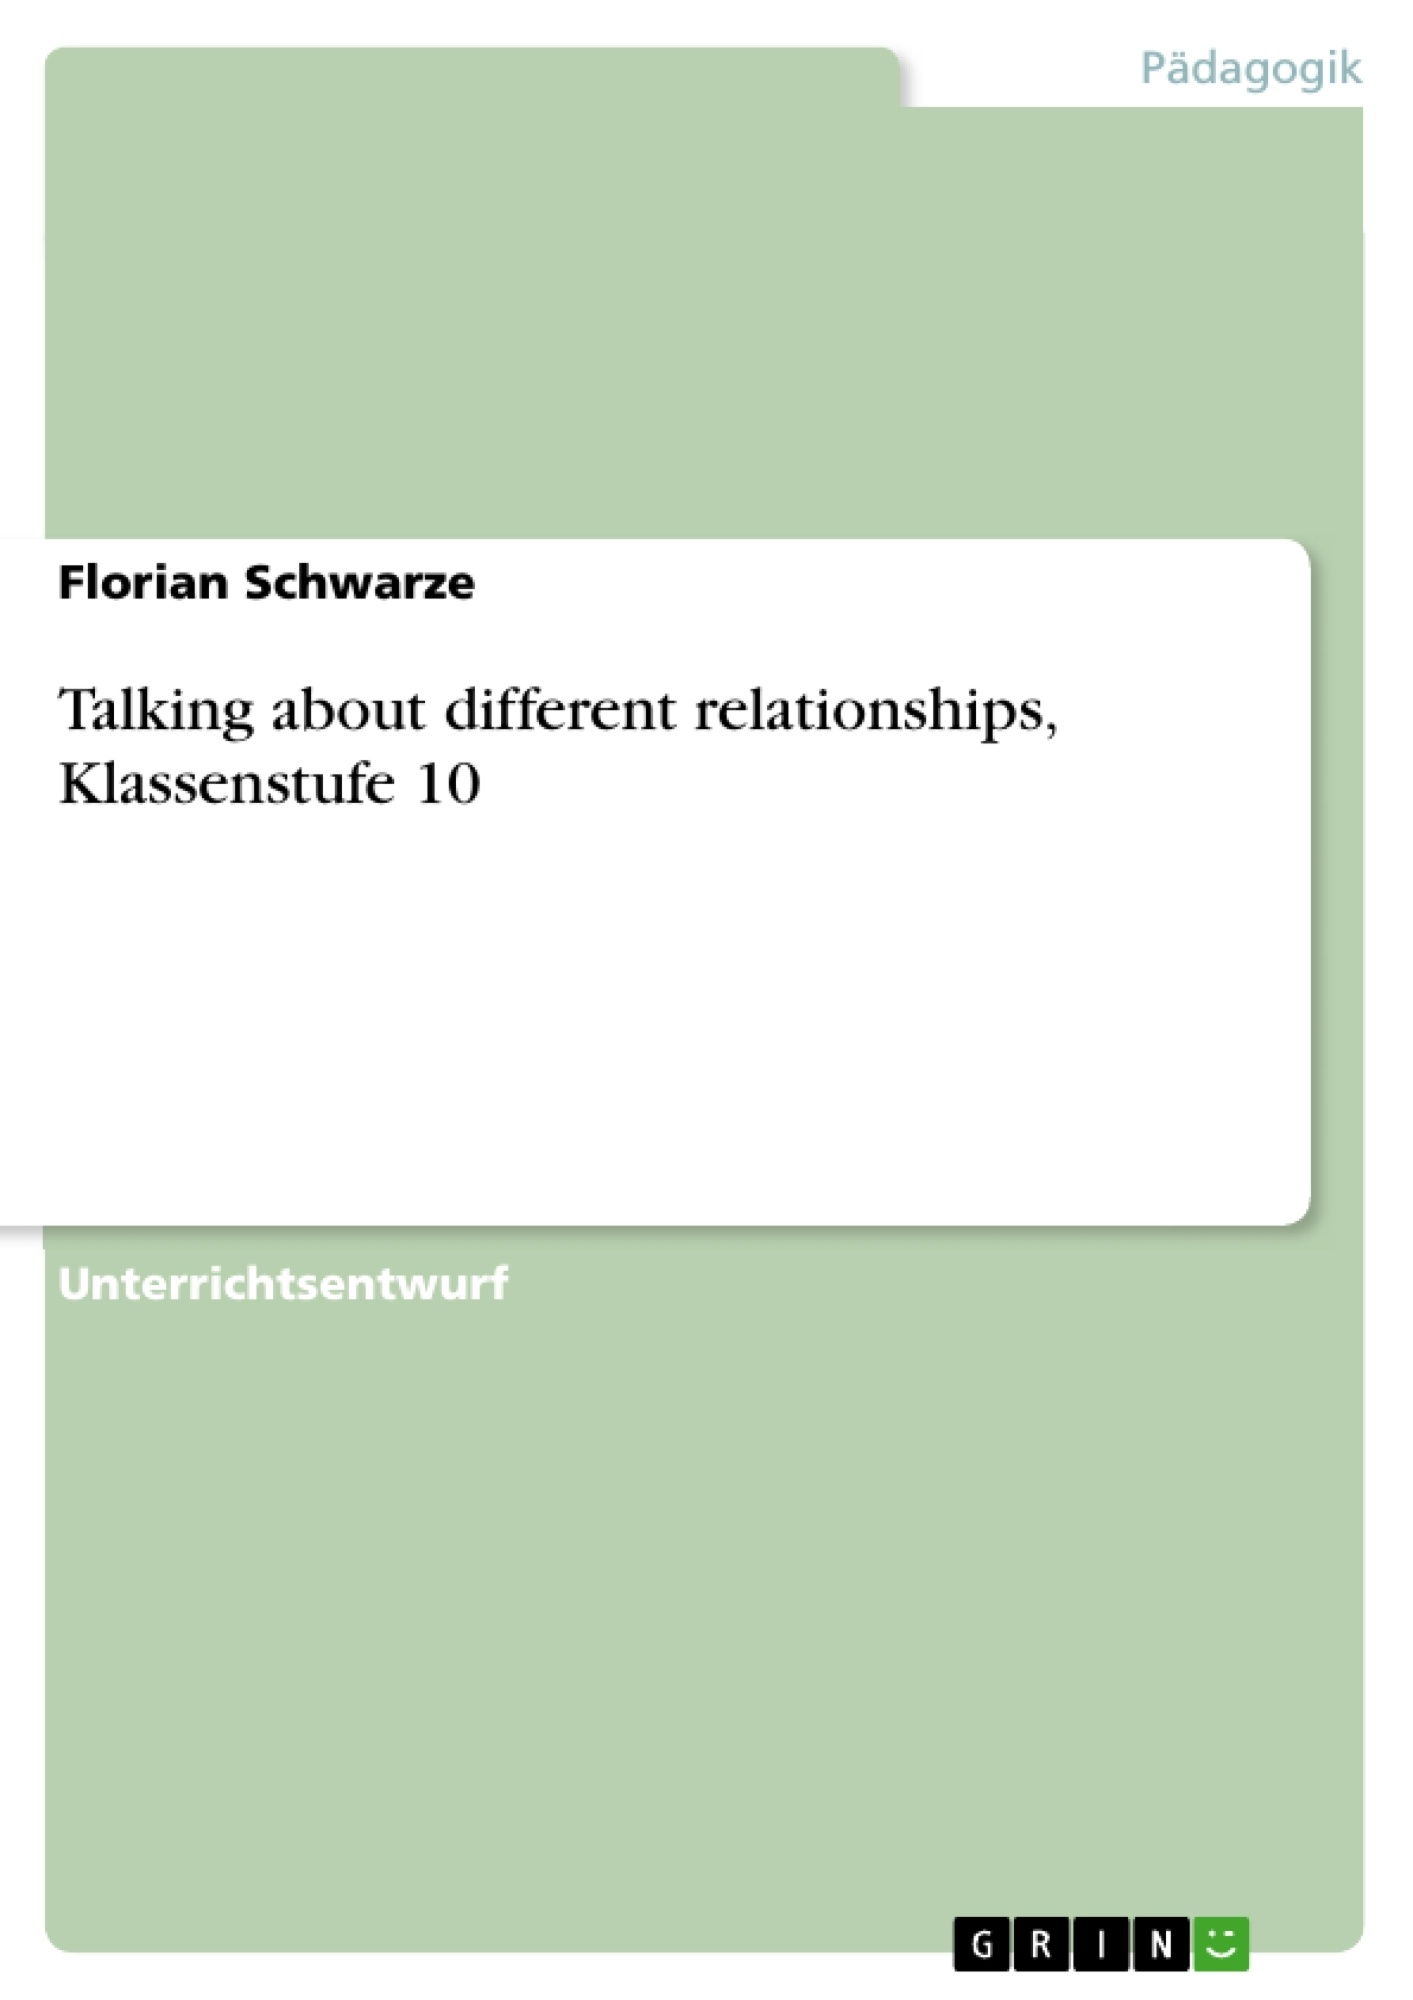 Titel: Talking about different relationships, Klassenstufe 10